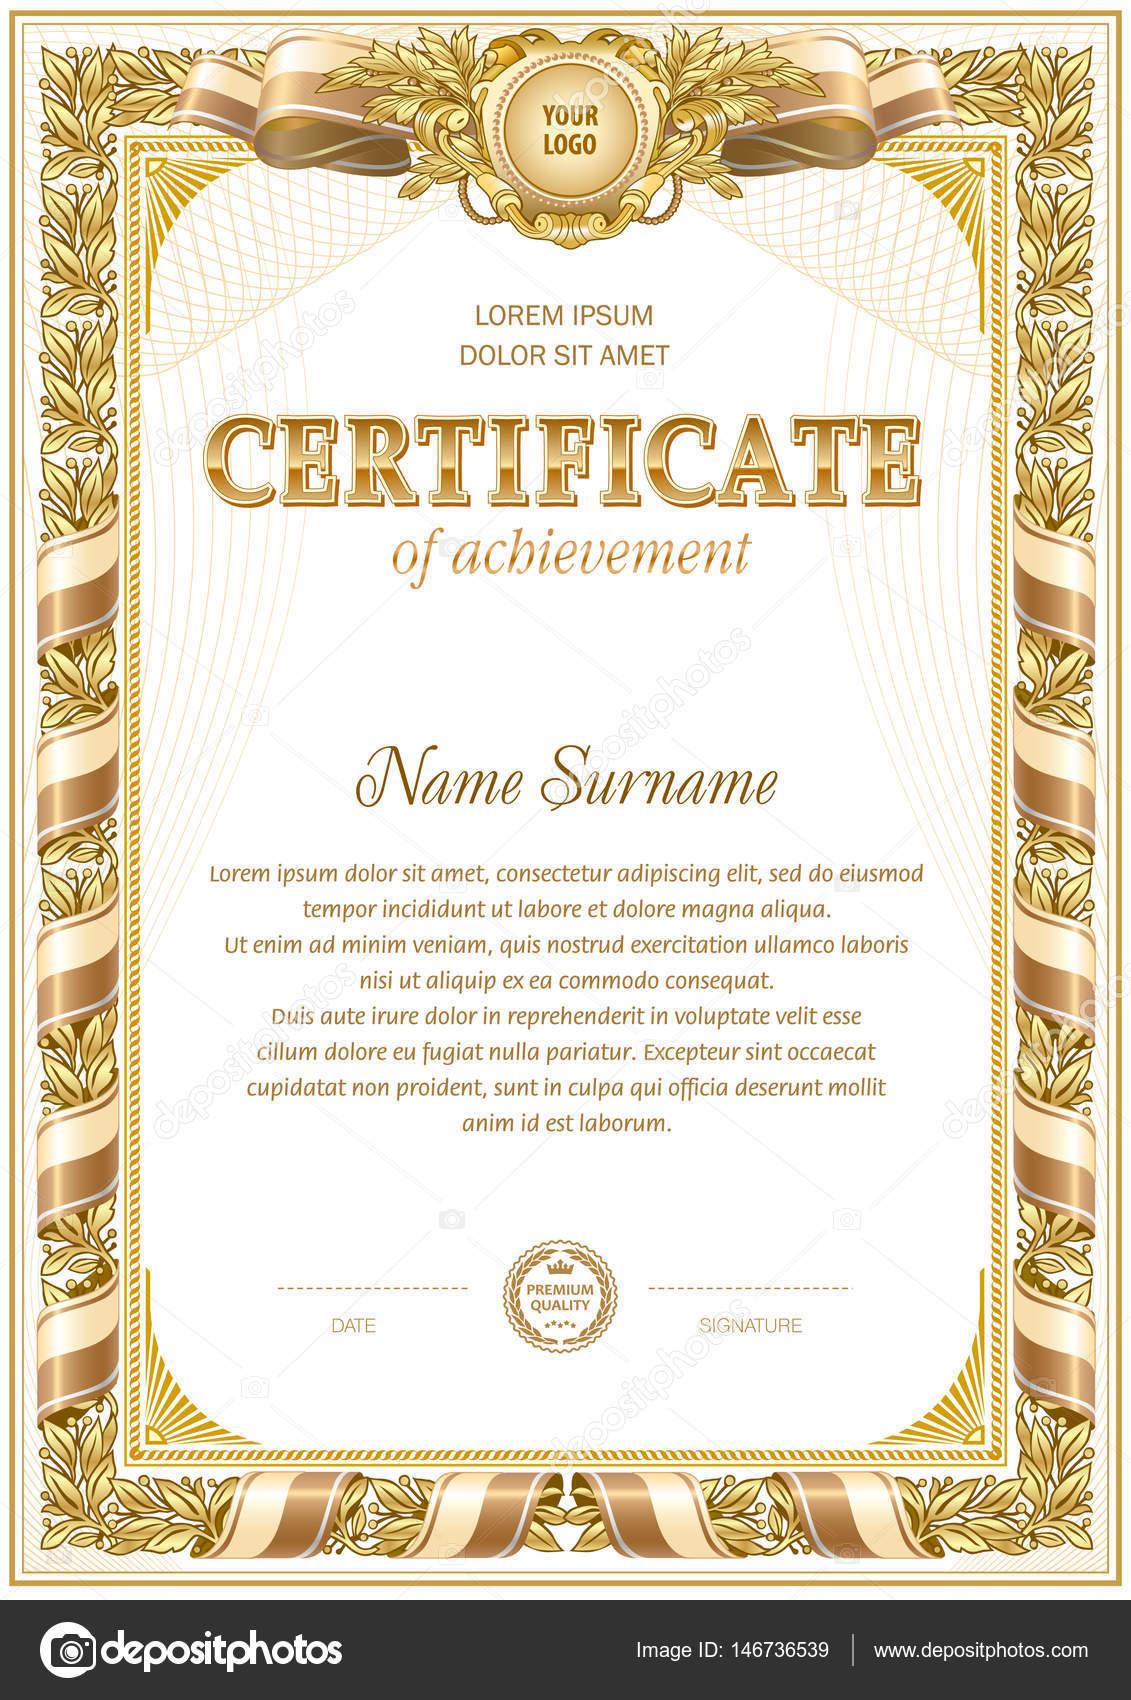 Zertifikat leere Vorlage — Stockvektor © tedgun #146736539